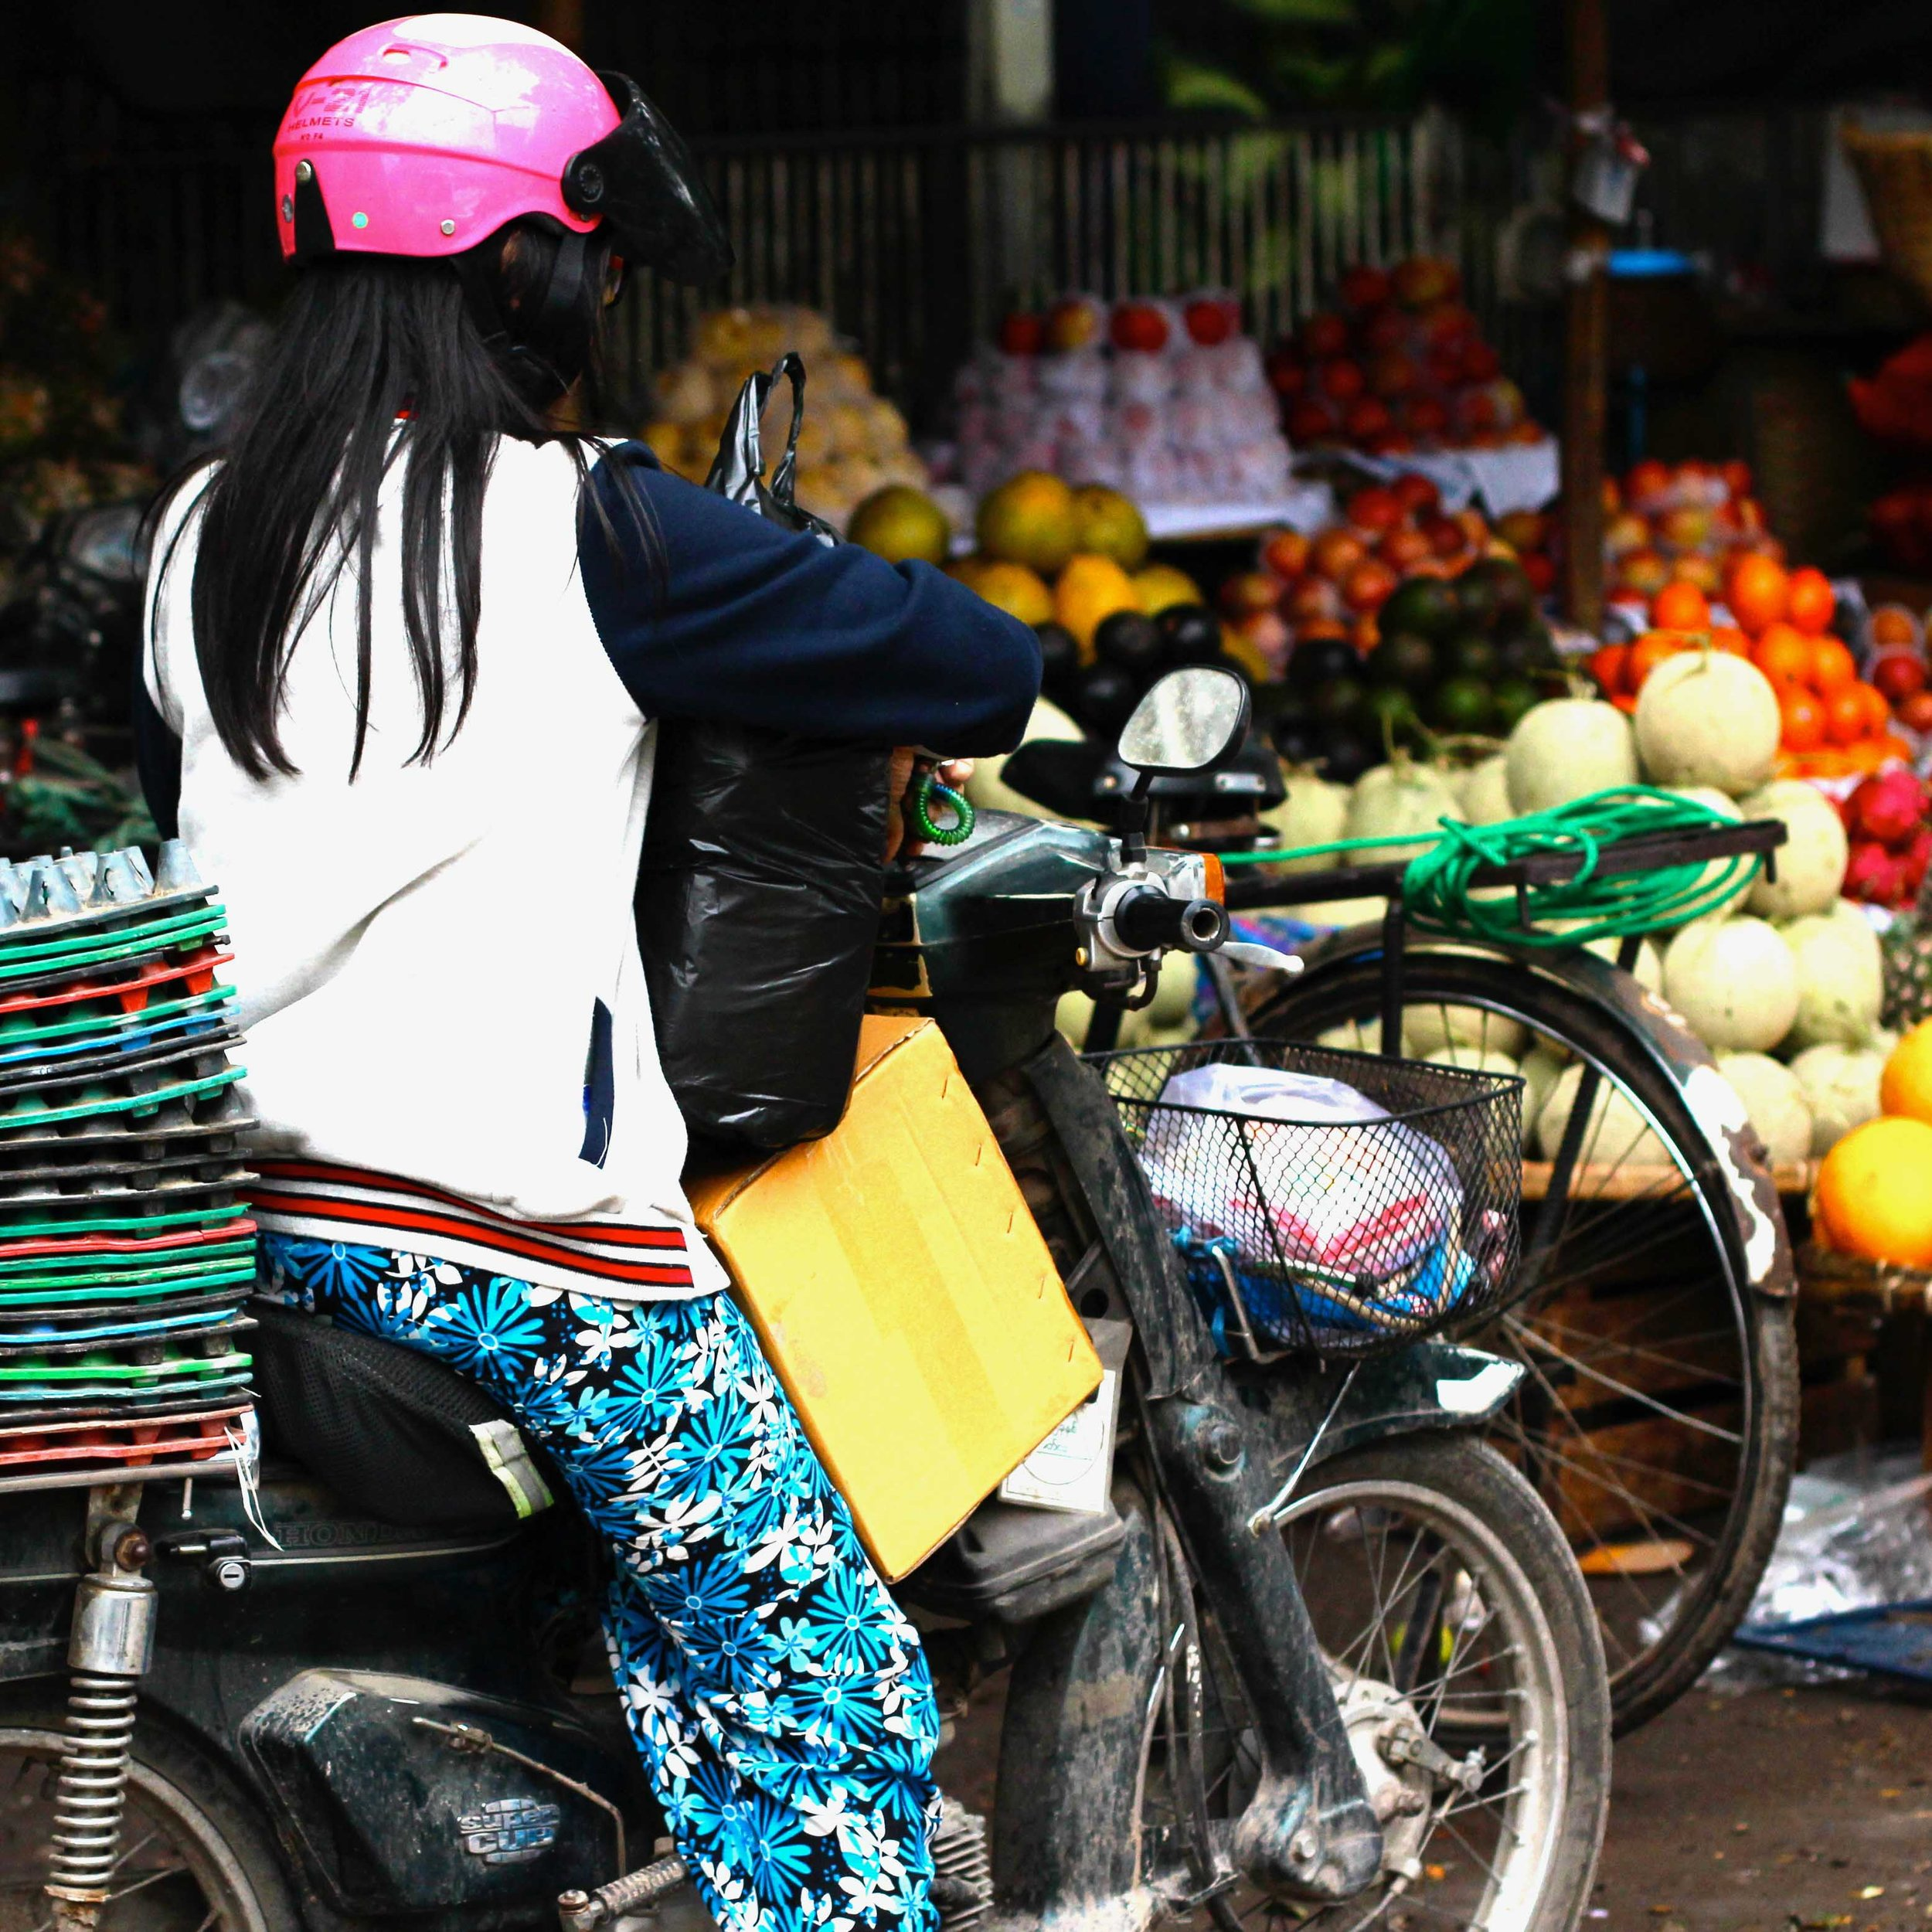 Mandalay's favored form of transportation